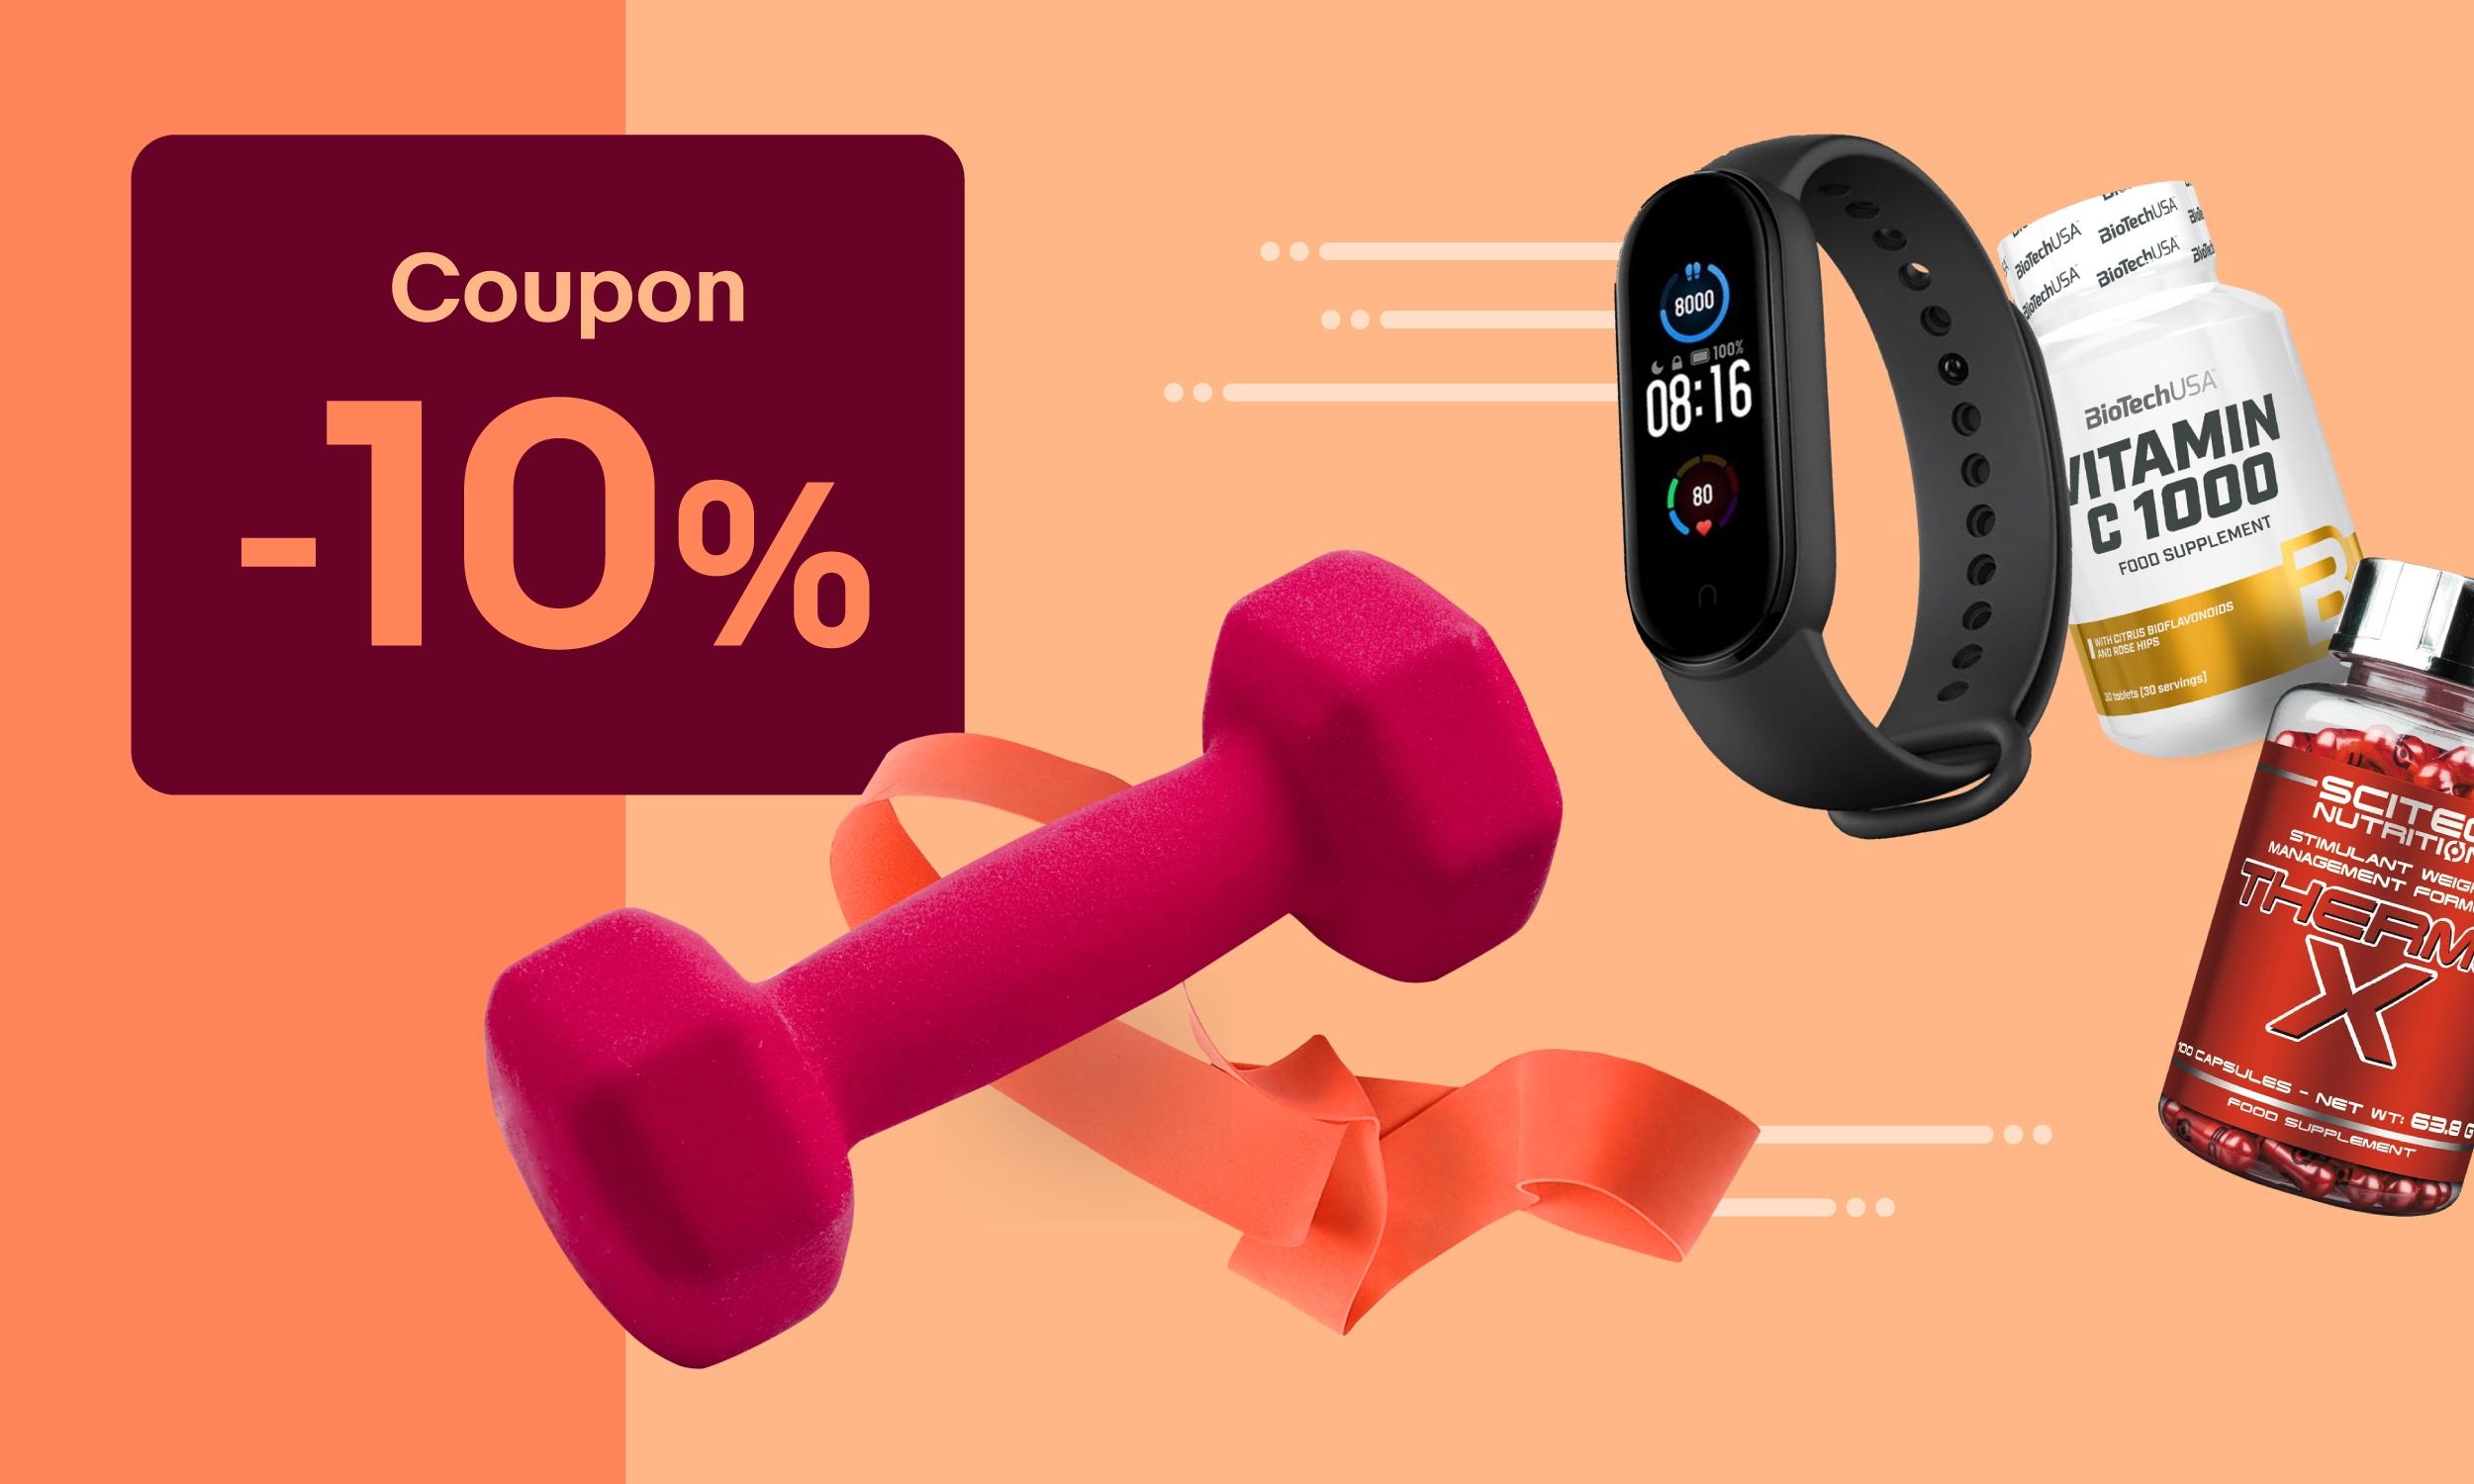 Codice Sconto Ebay: 10% Sport & Lifestyle